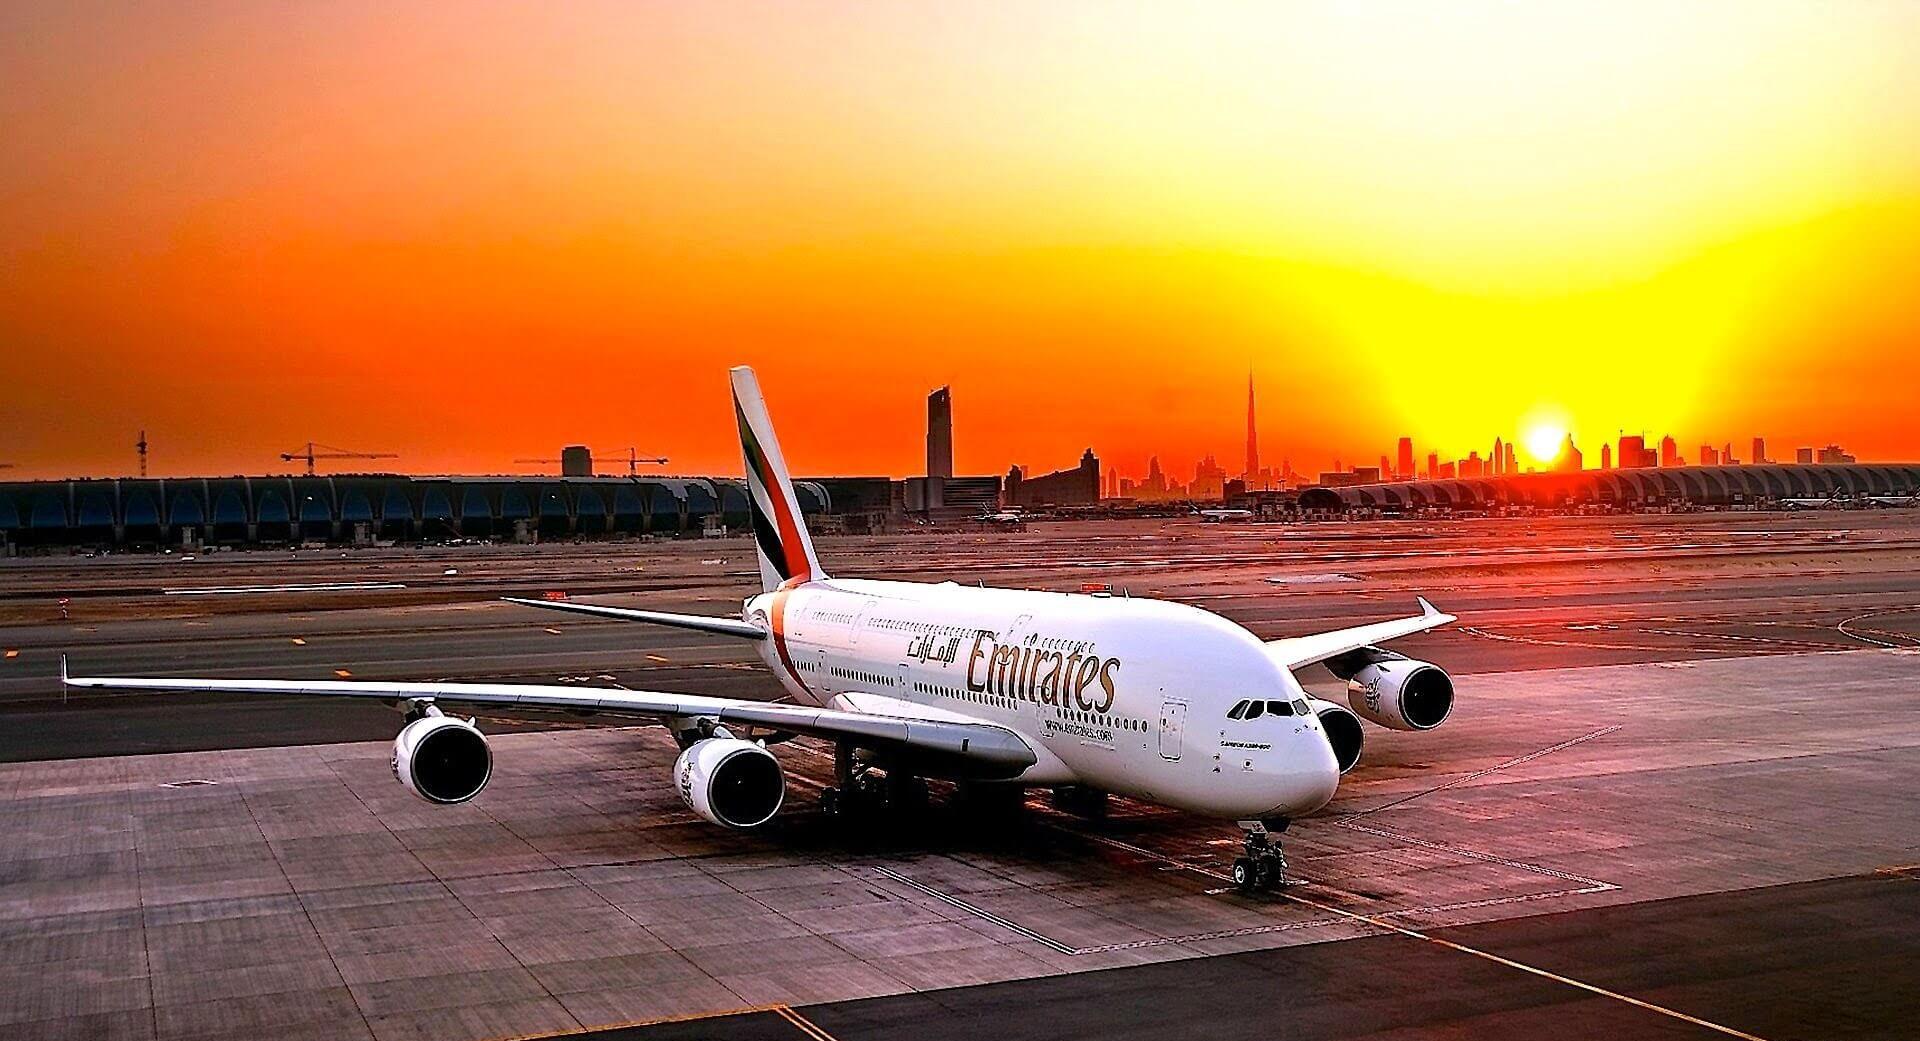 International Airport in India